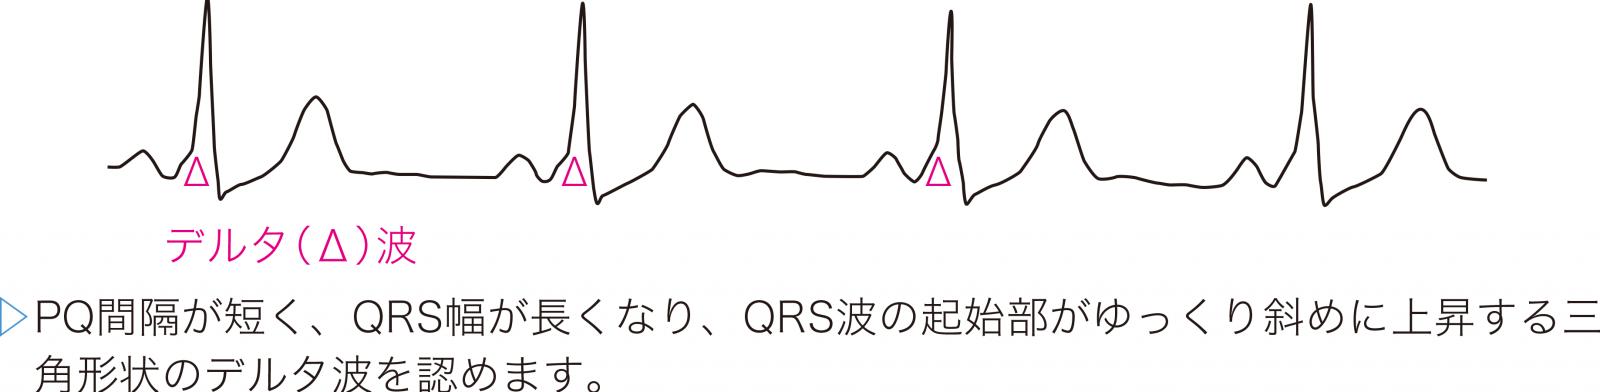 WPW症候群の心電図波形